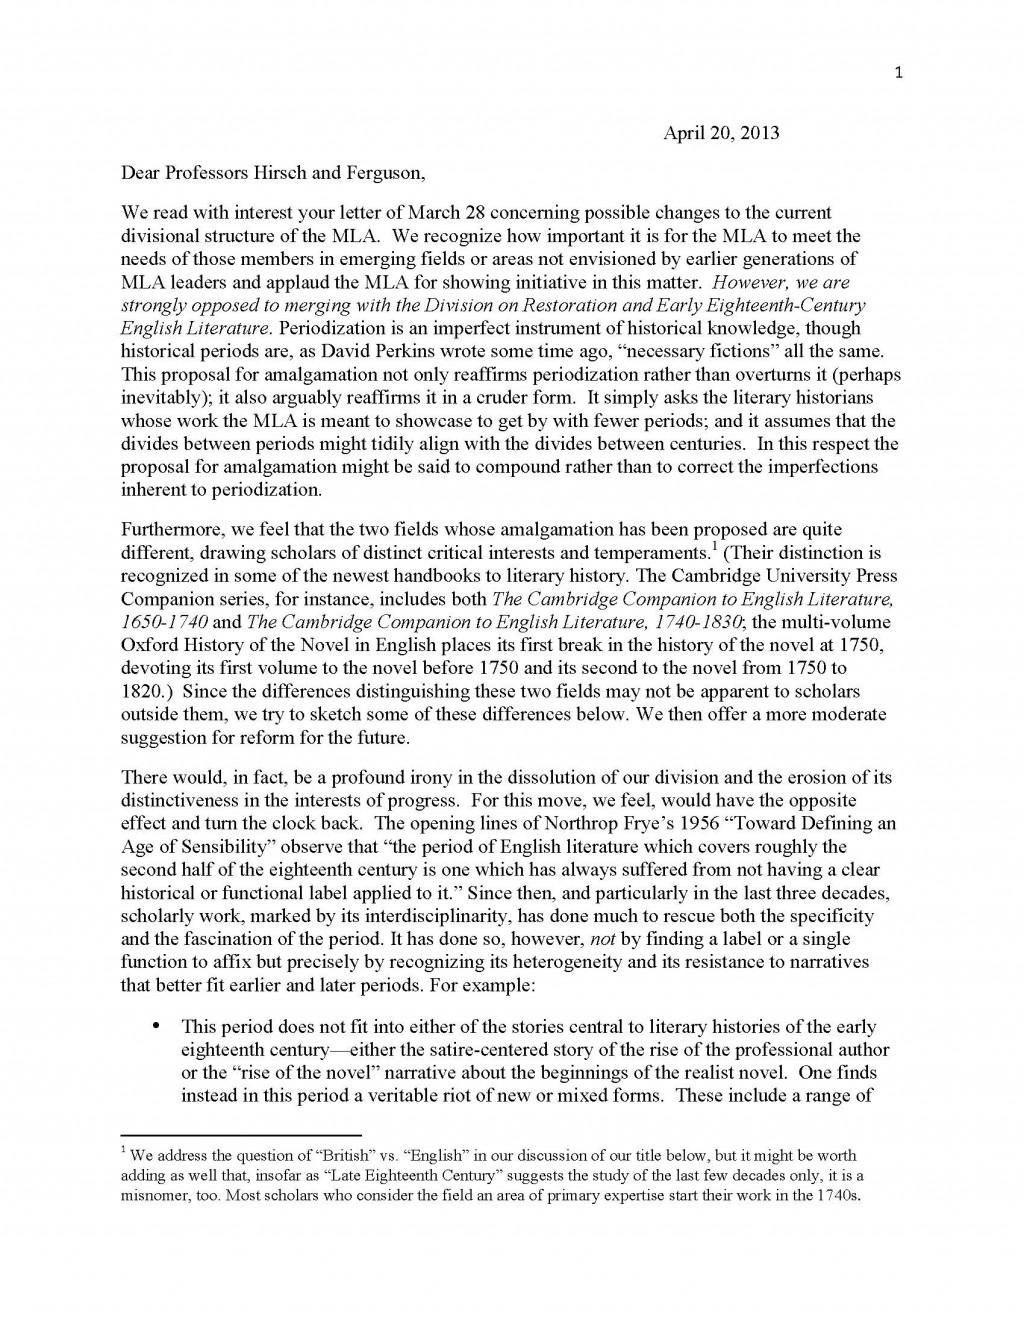 016 Response To Marianne Hirsch Margaret Ferguson Rev Final Copy Page 1 Free Professional Essays Essay Impressive Large